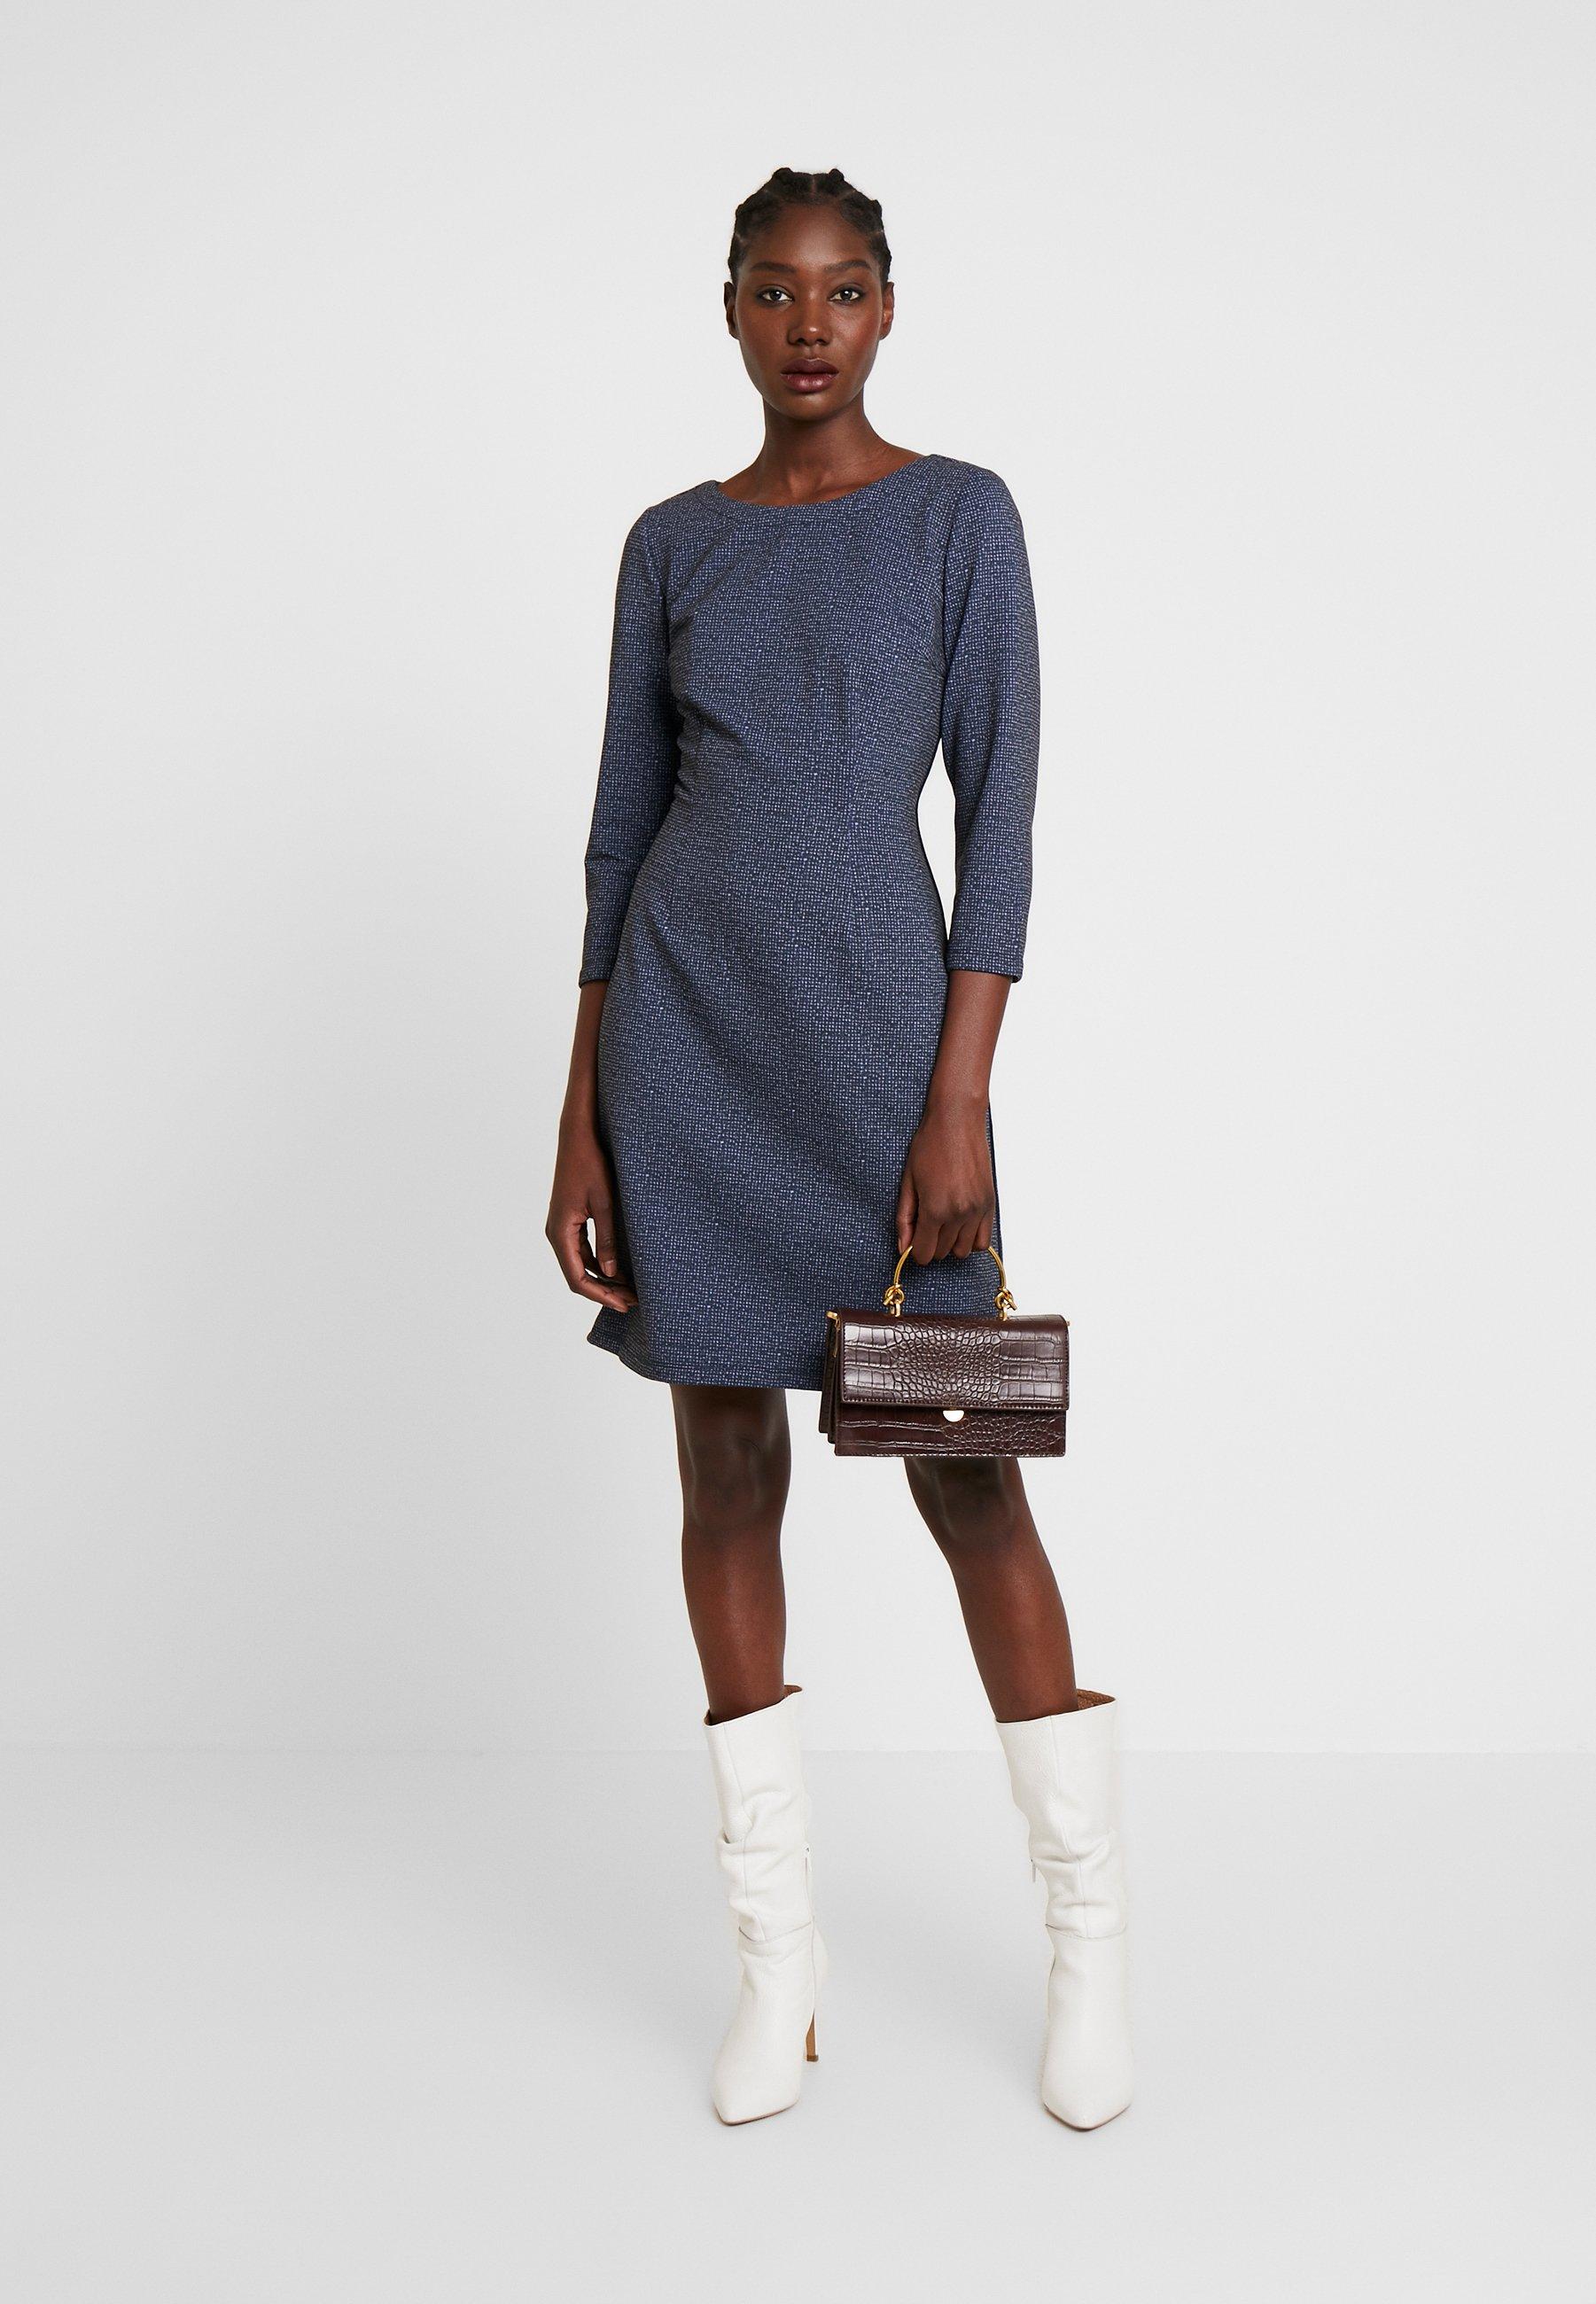 Tom Tailor Dress Casual - Jerseykjole Navy Blue